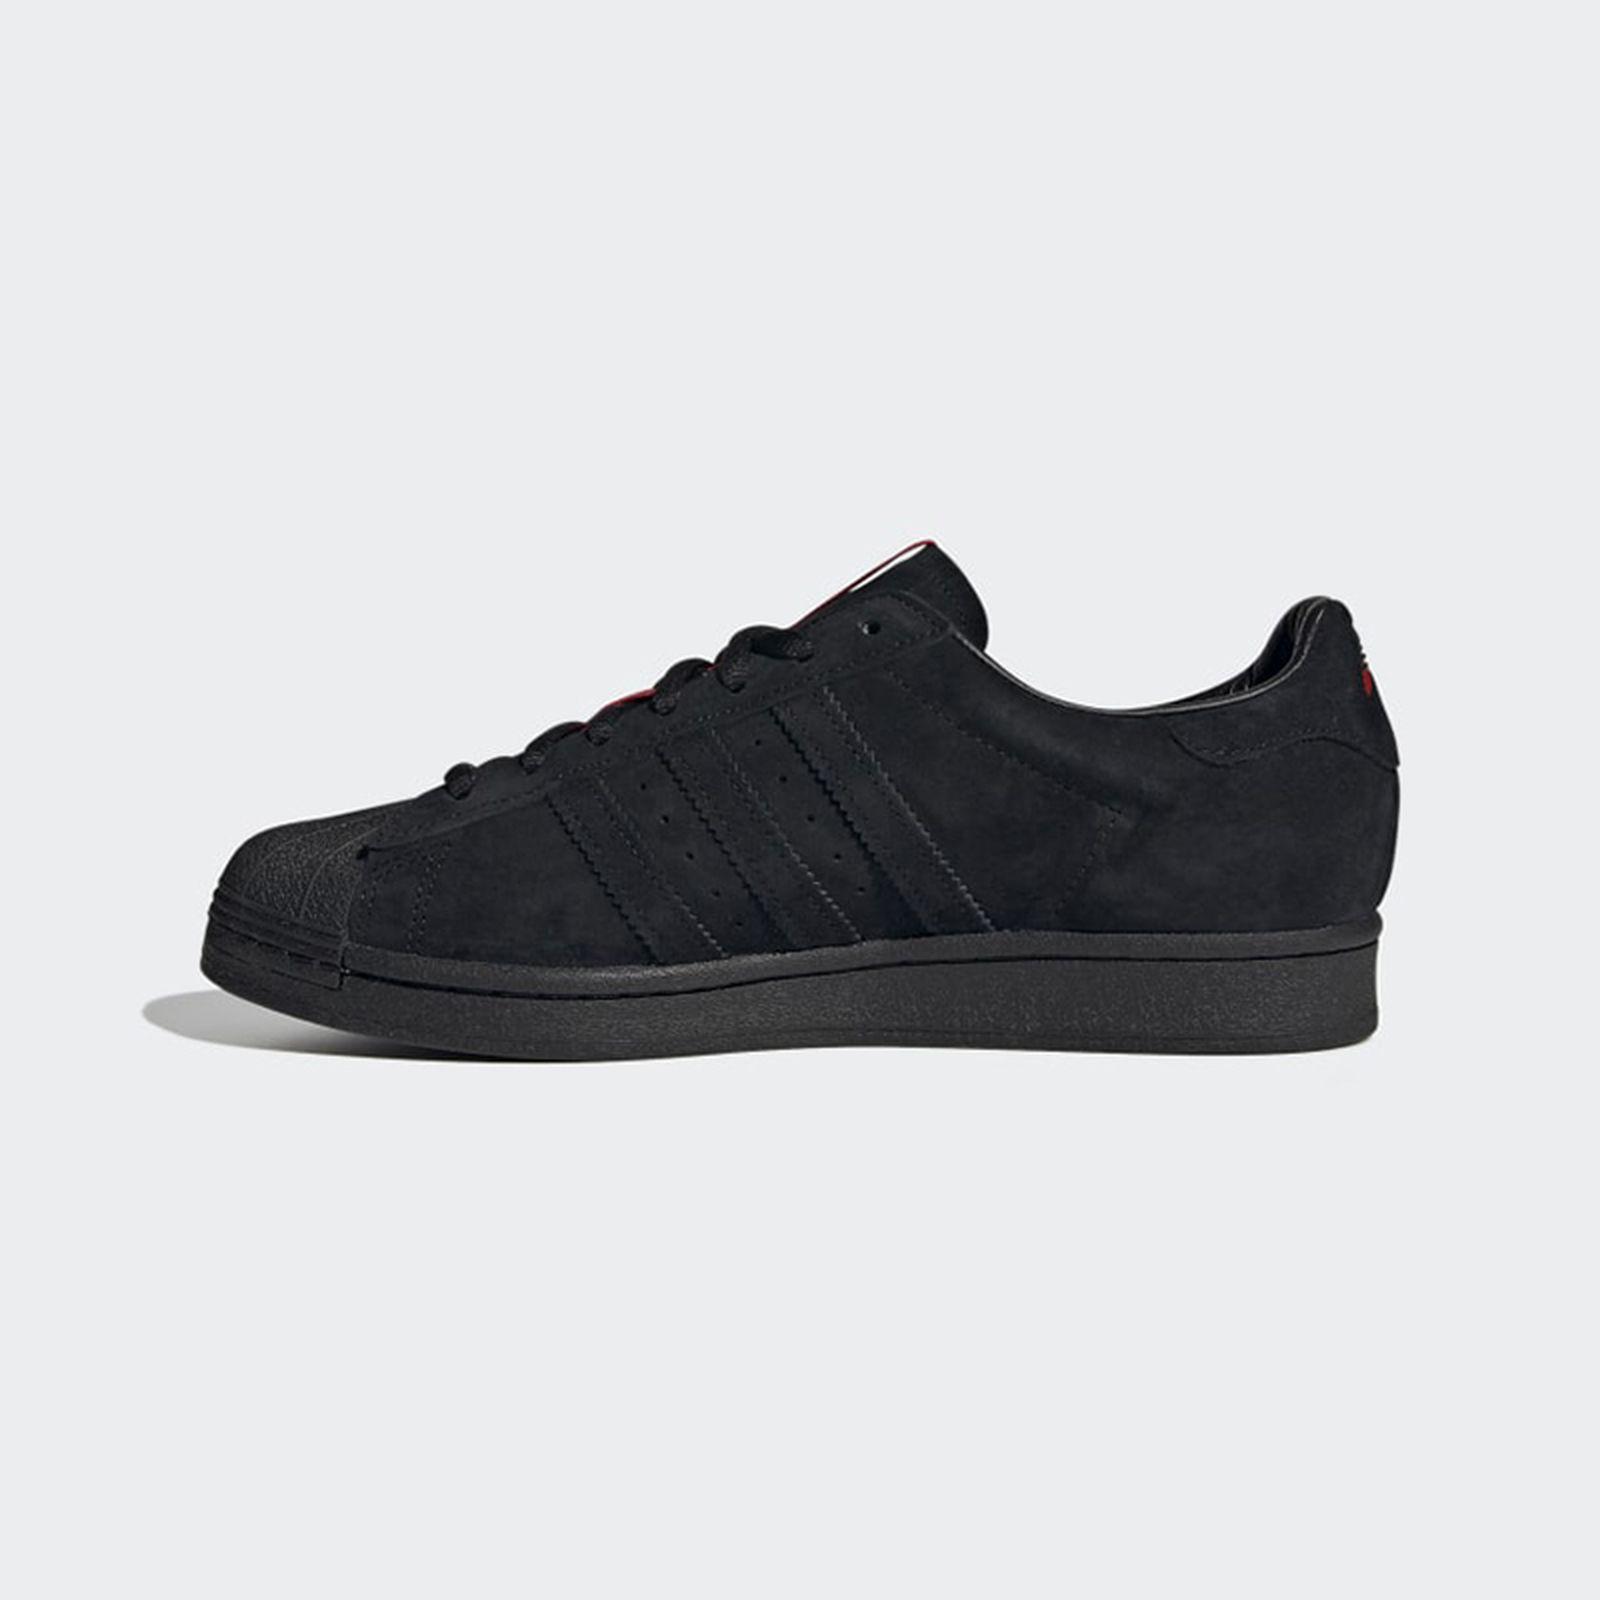 thrasher-adidas-superstar-adv-tyshawn-jones-release-date-price-1-05